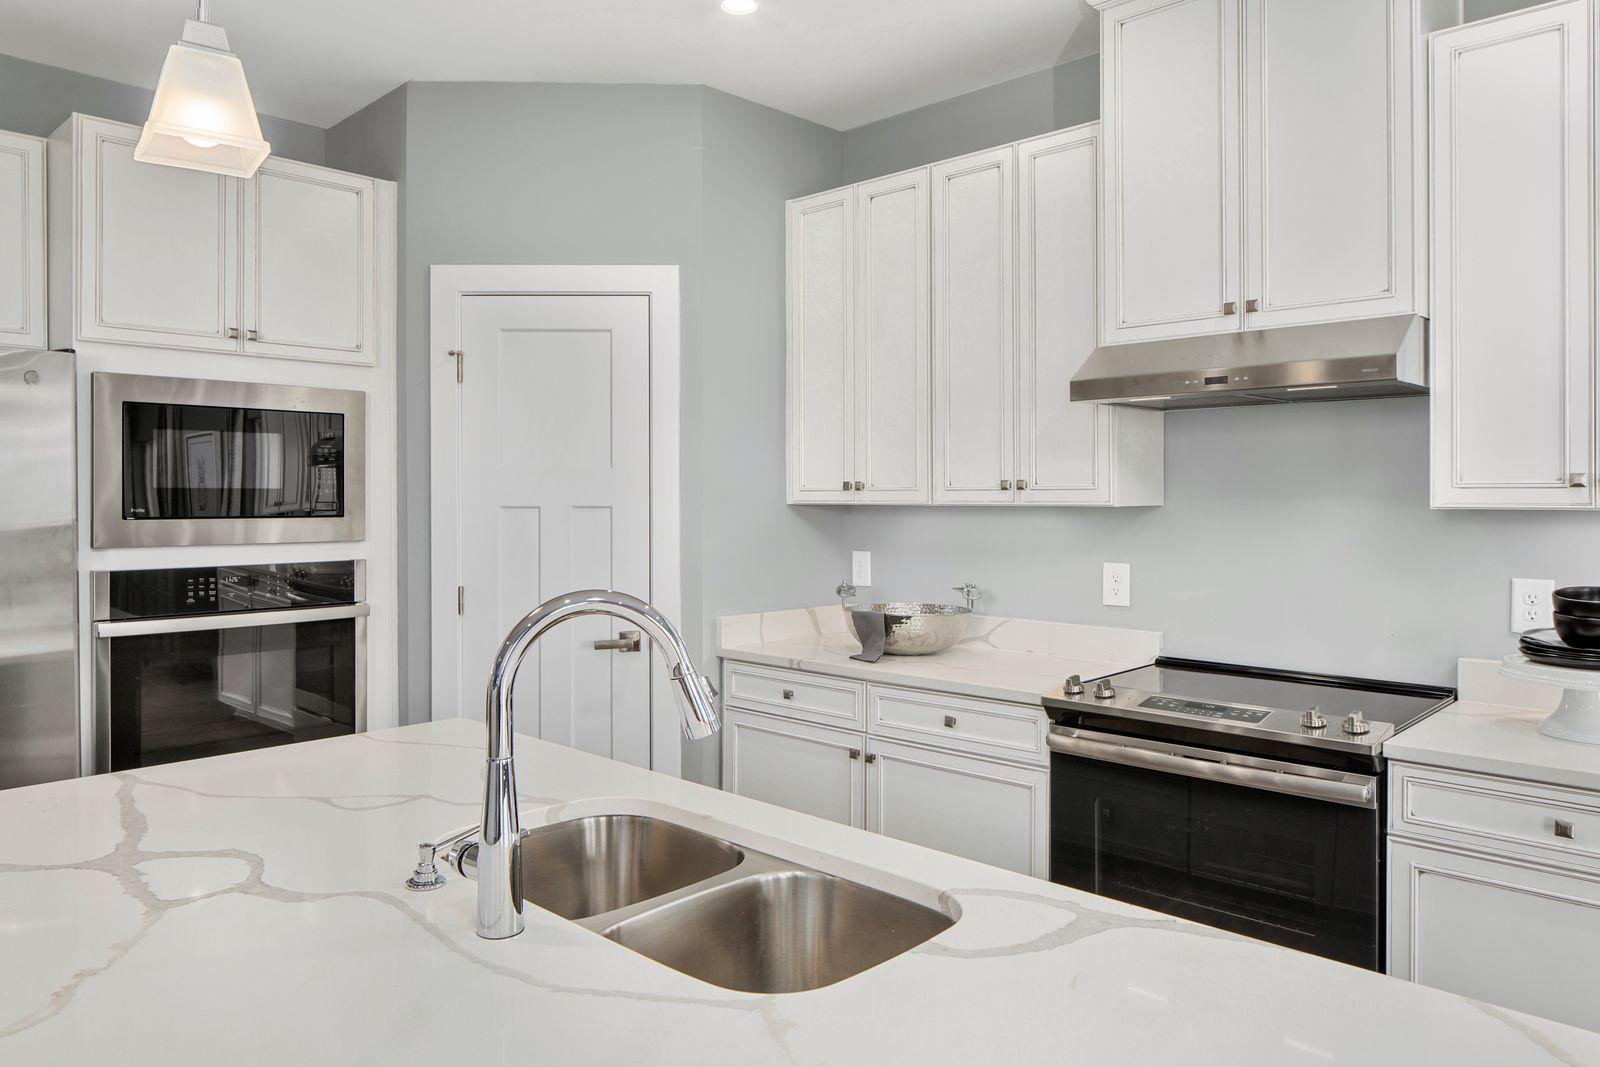 Kitchen featured in the Savannah By Ryan Homes in Nashville, TN